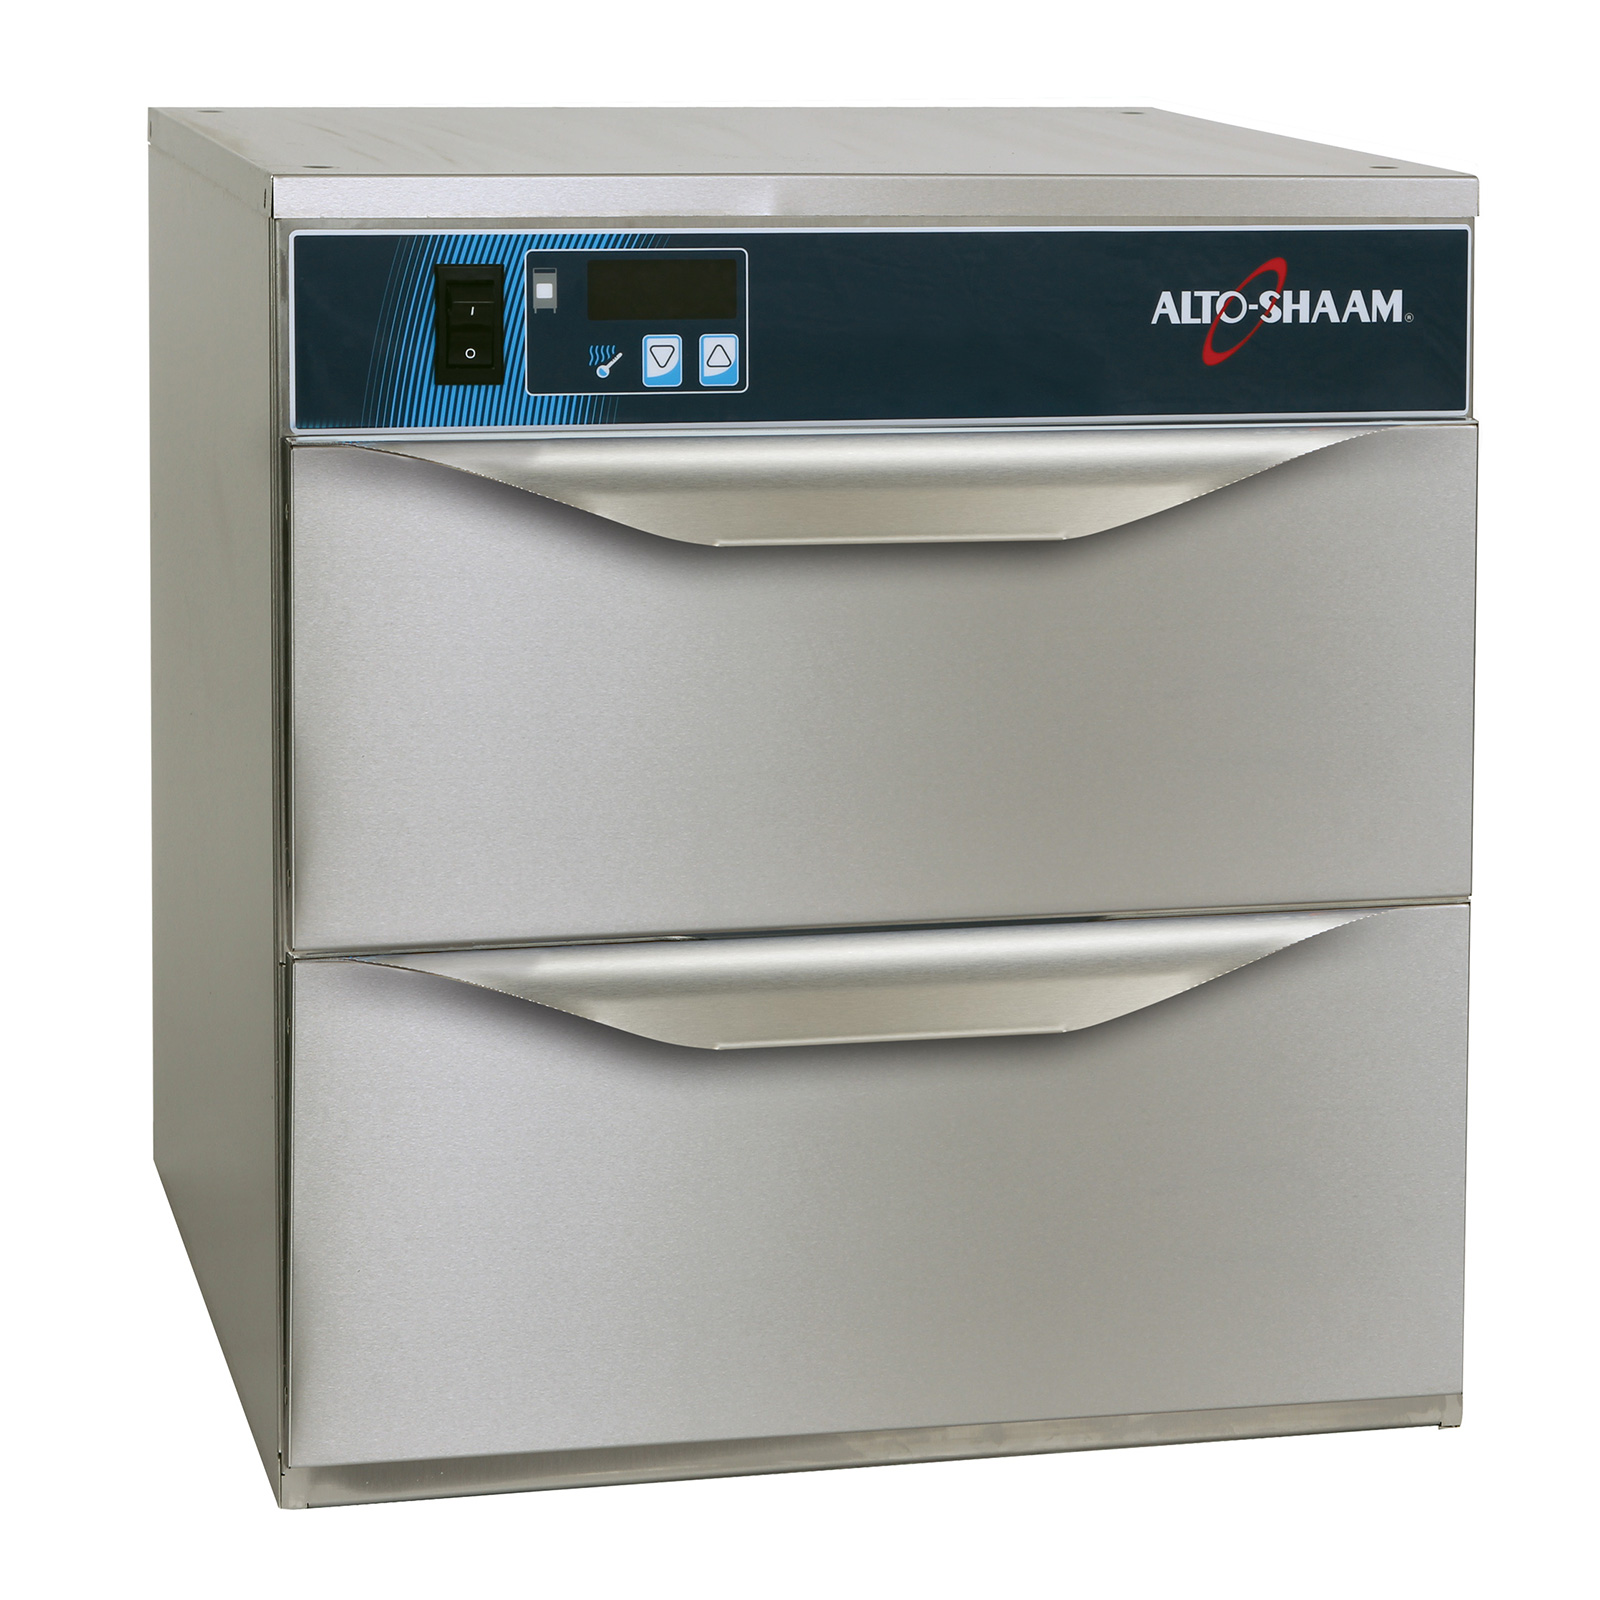 Alto-Shaam 500-2DN warming drawer, free standing